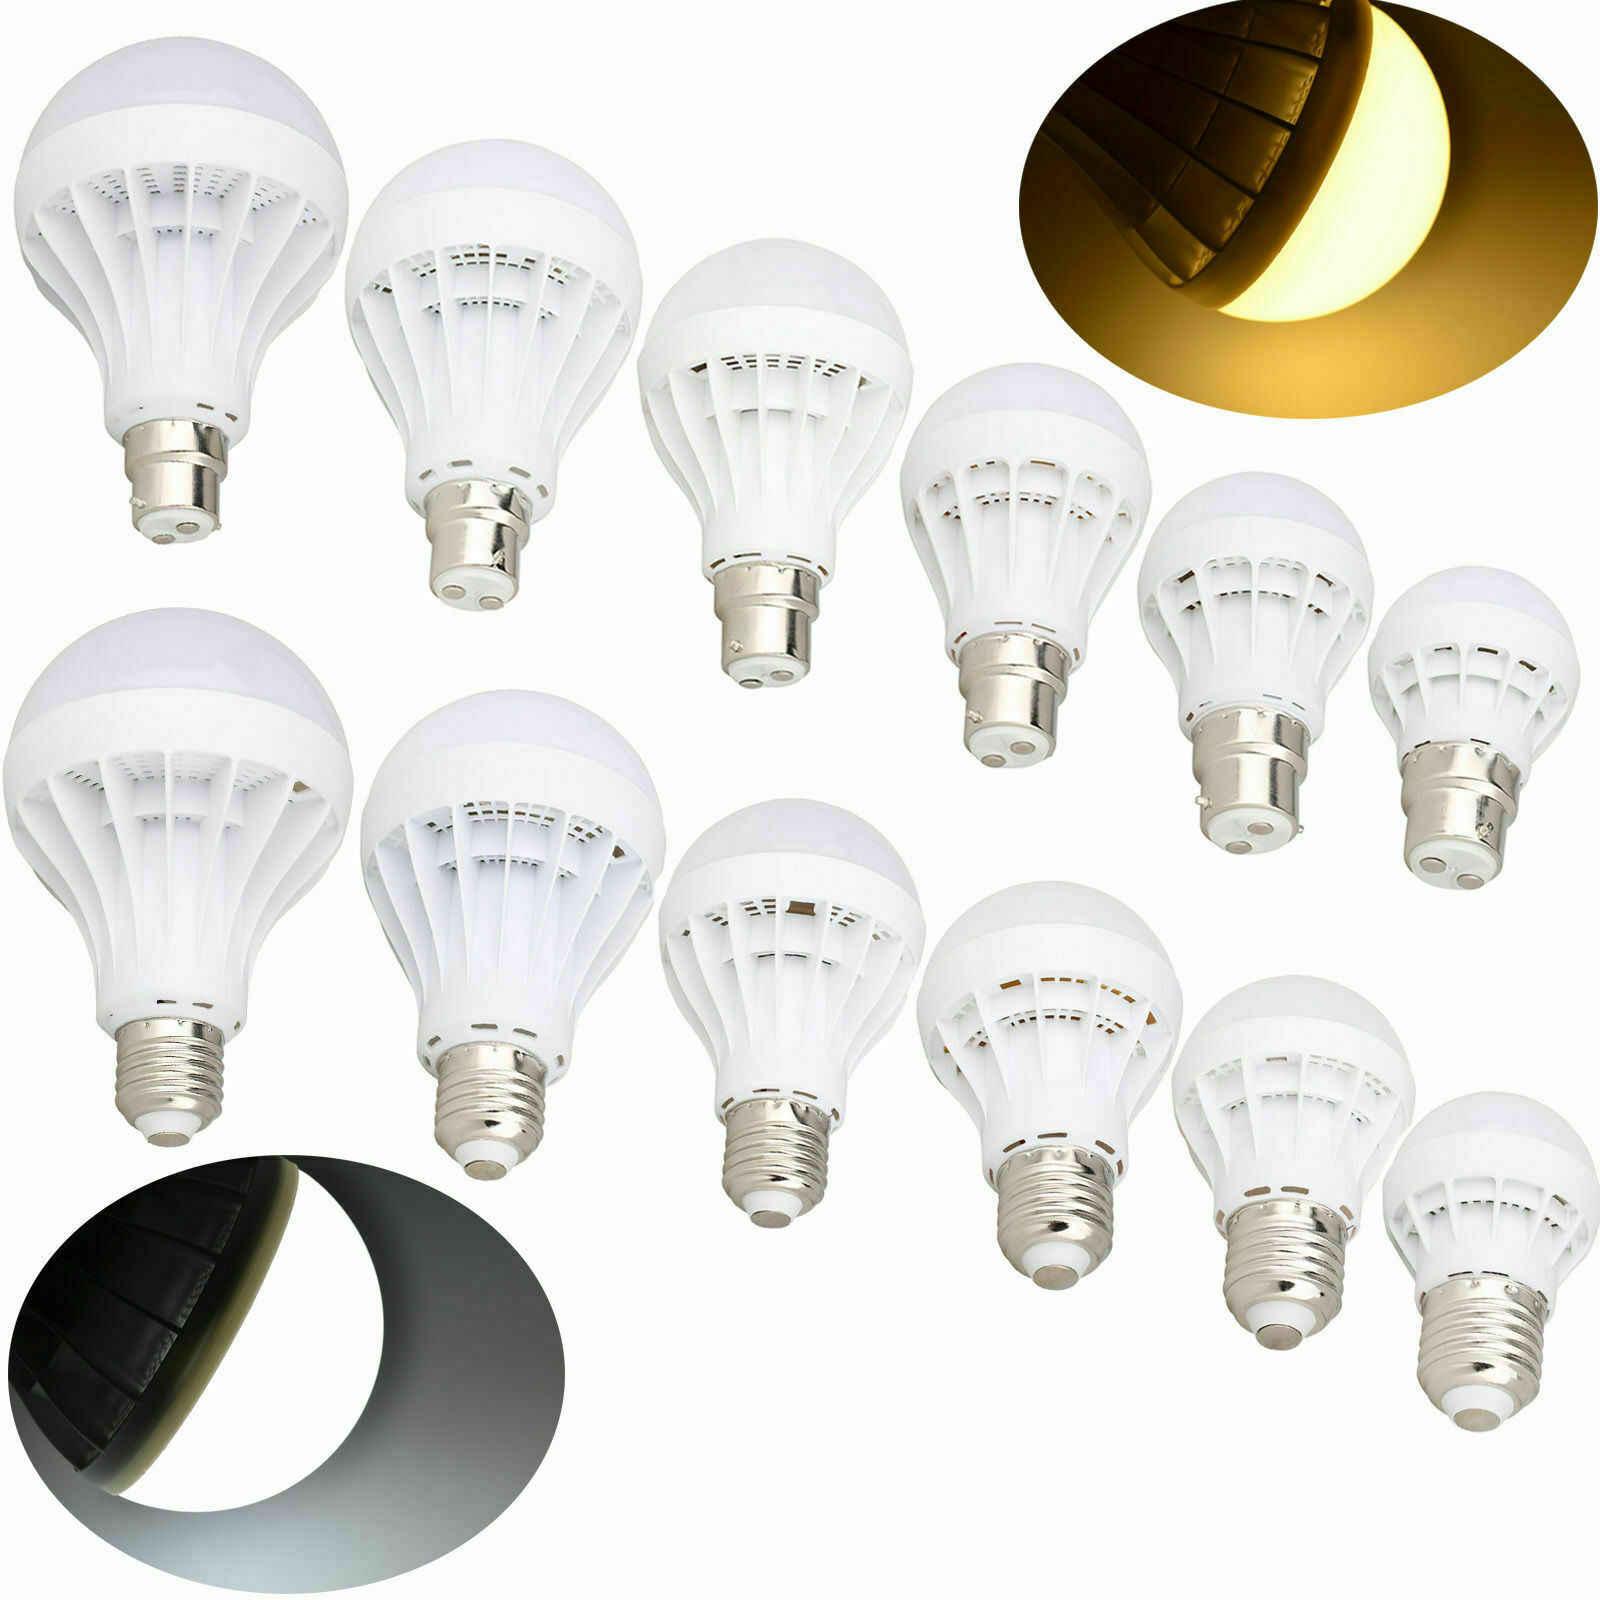 LED グローブ電球キャンドル電球 B22 E27 E14 B15 3 ワット 5 ワット 7 ワット 9 ワット 12 ワット 5730 SMD 110V 220V ホームシャンデリア炎ランプ交換電球